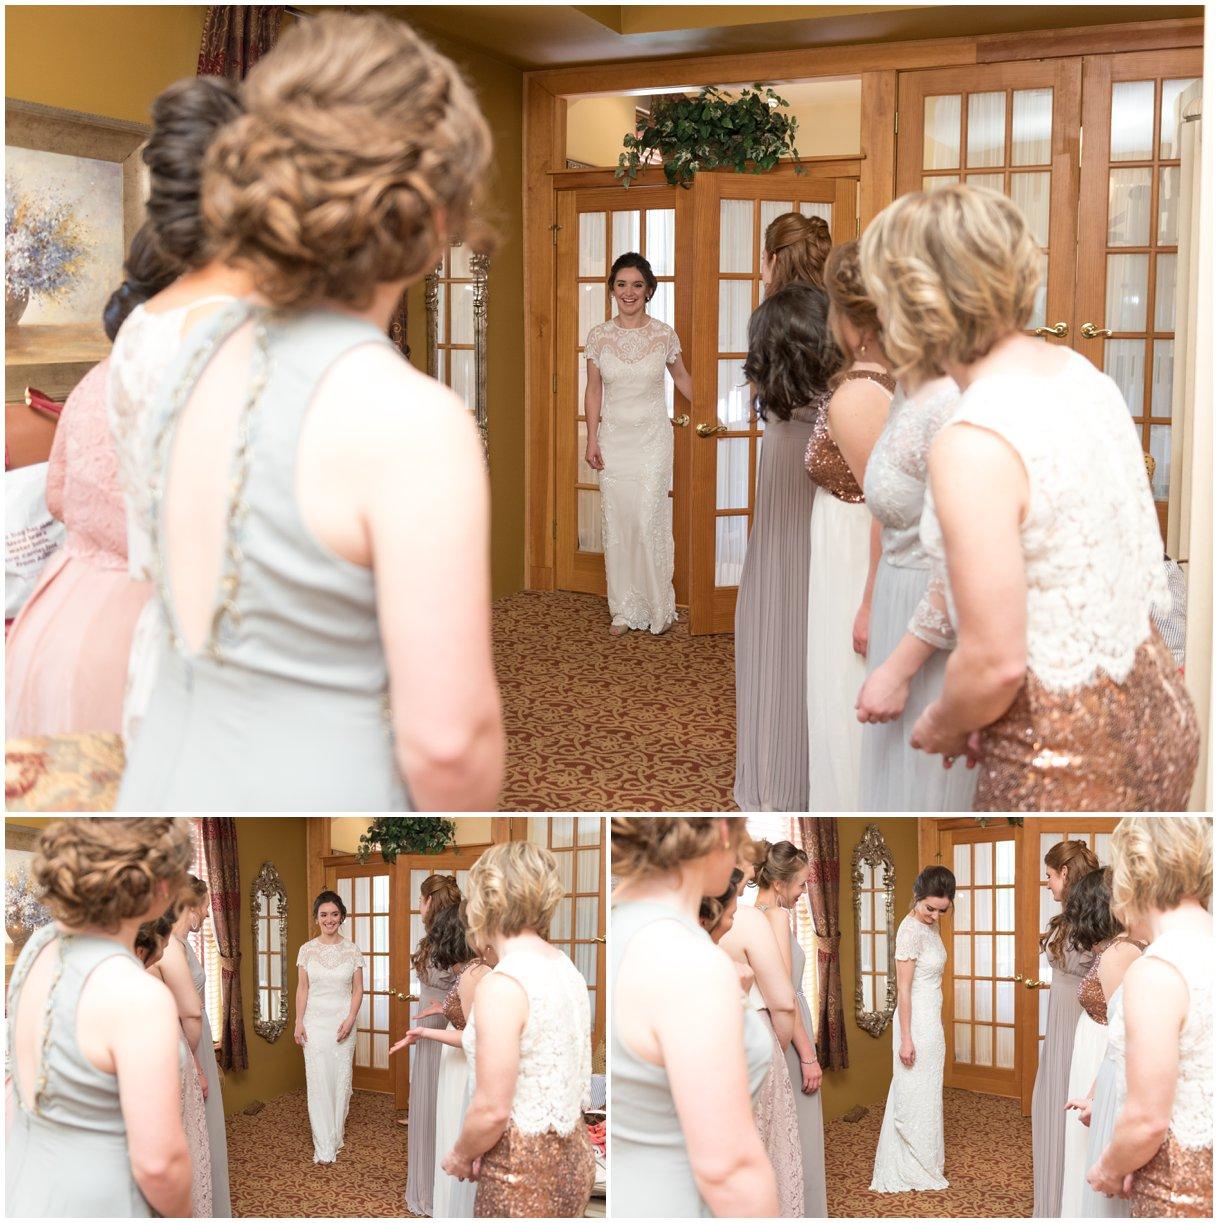 leolainn-lancasterwedding-photographer-photography-outdoor-wedding-firstlook-photo